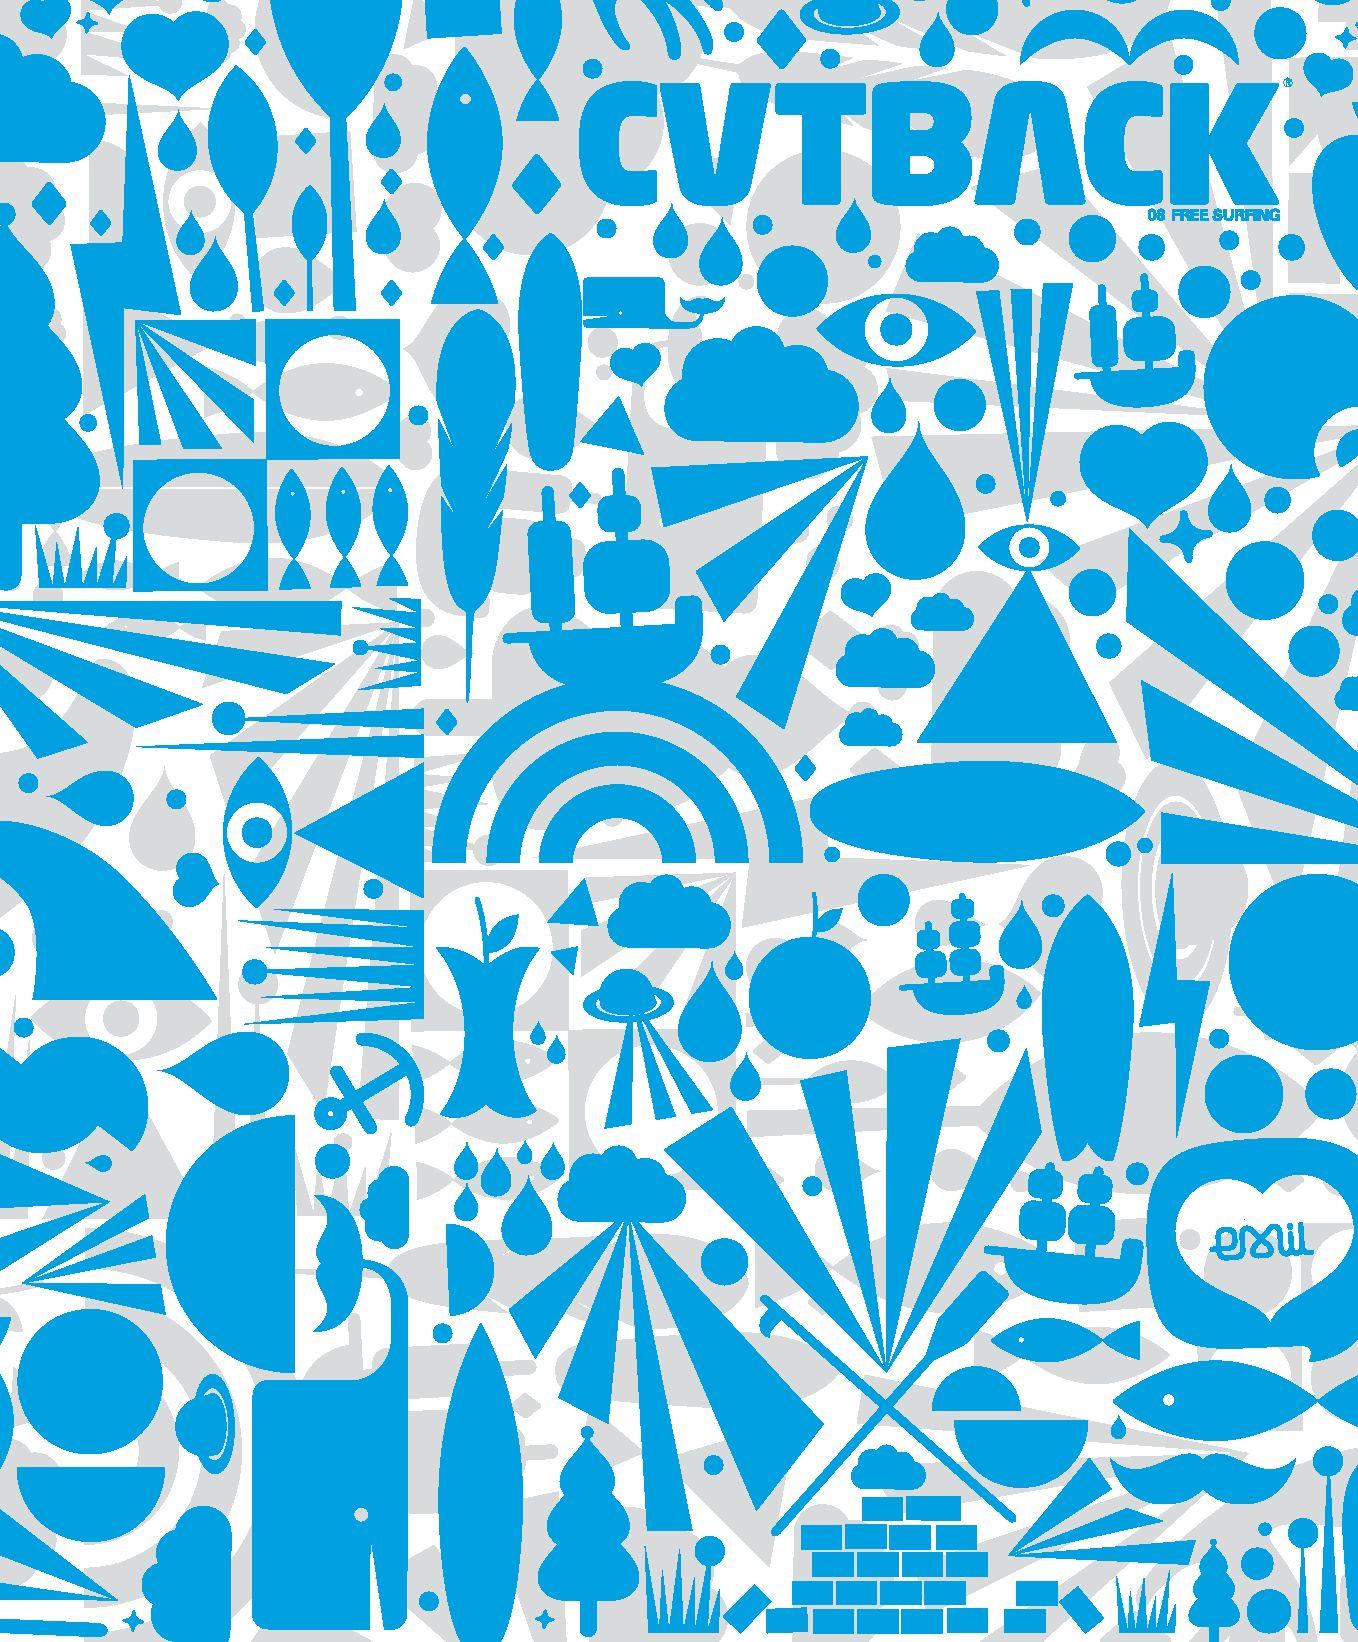 d159189de519 CUTBACK 08- FREE SURFING MAGAZINE by CUTBACK - issuu